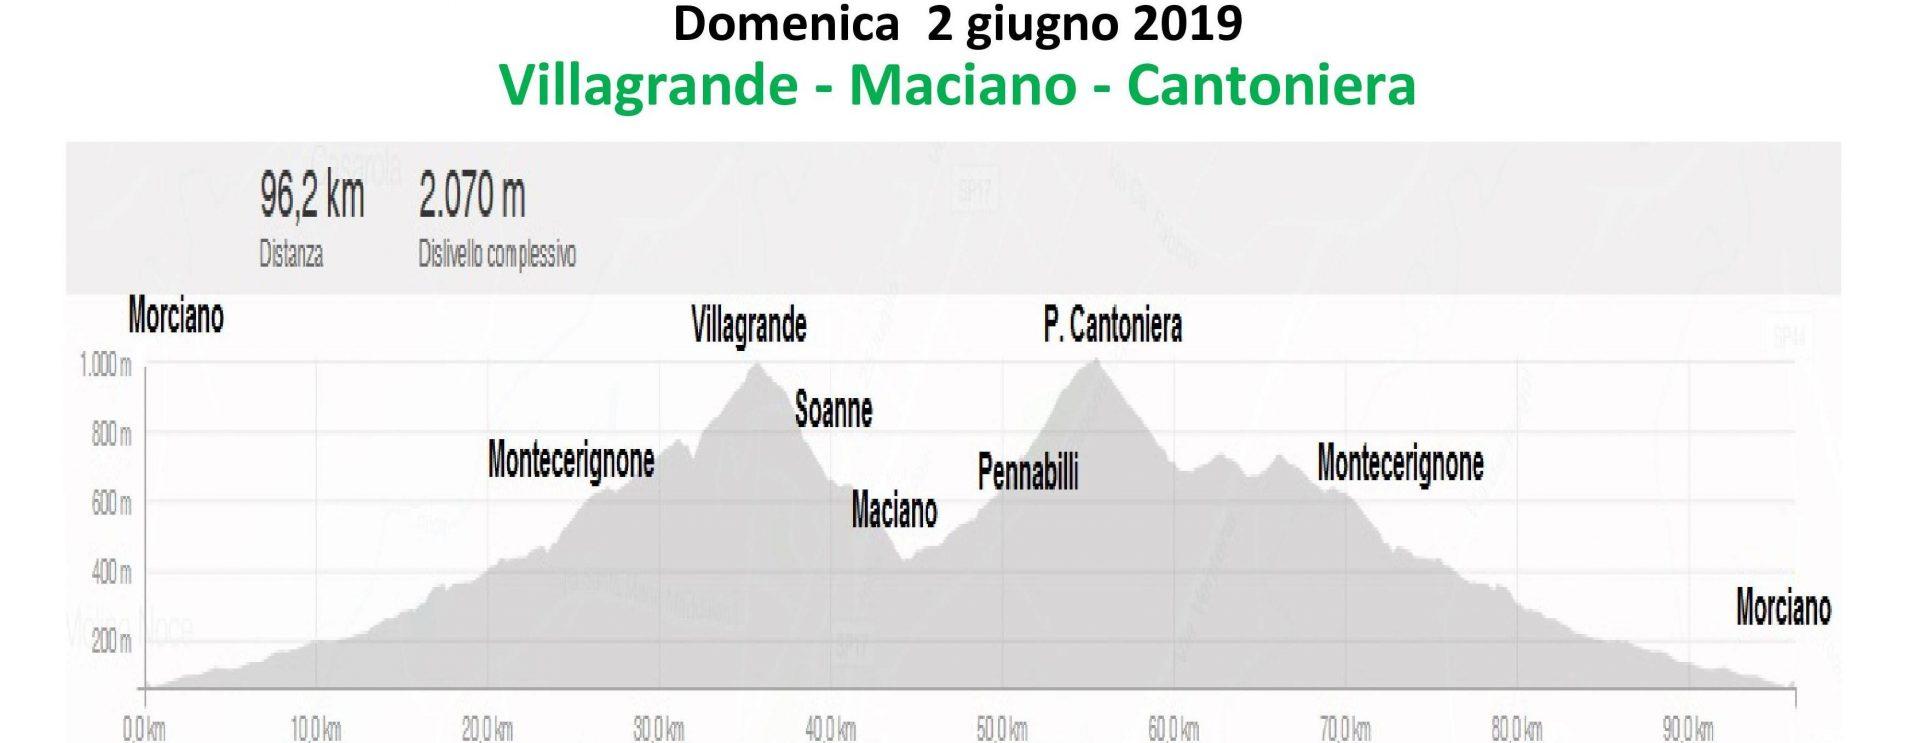 Domenica 02-giu-2019 Villagrande Maciano Cantoniera